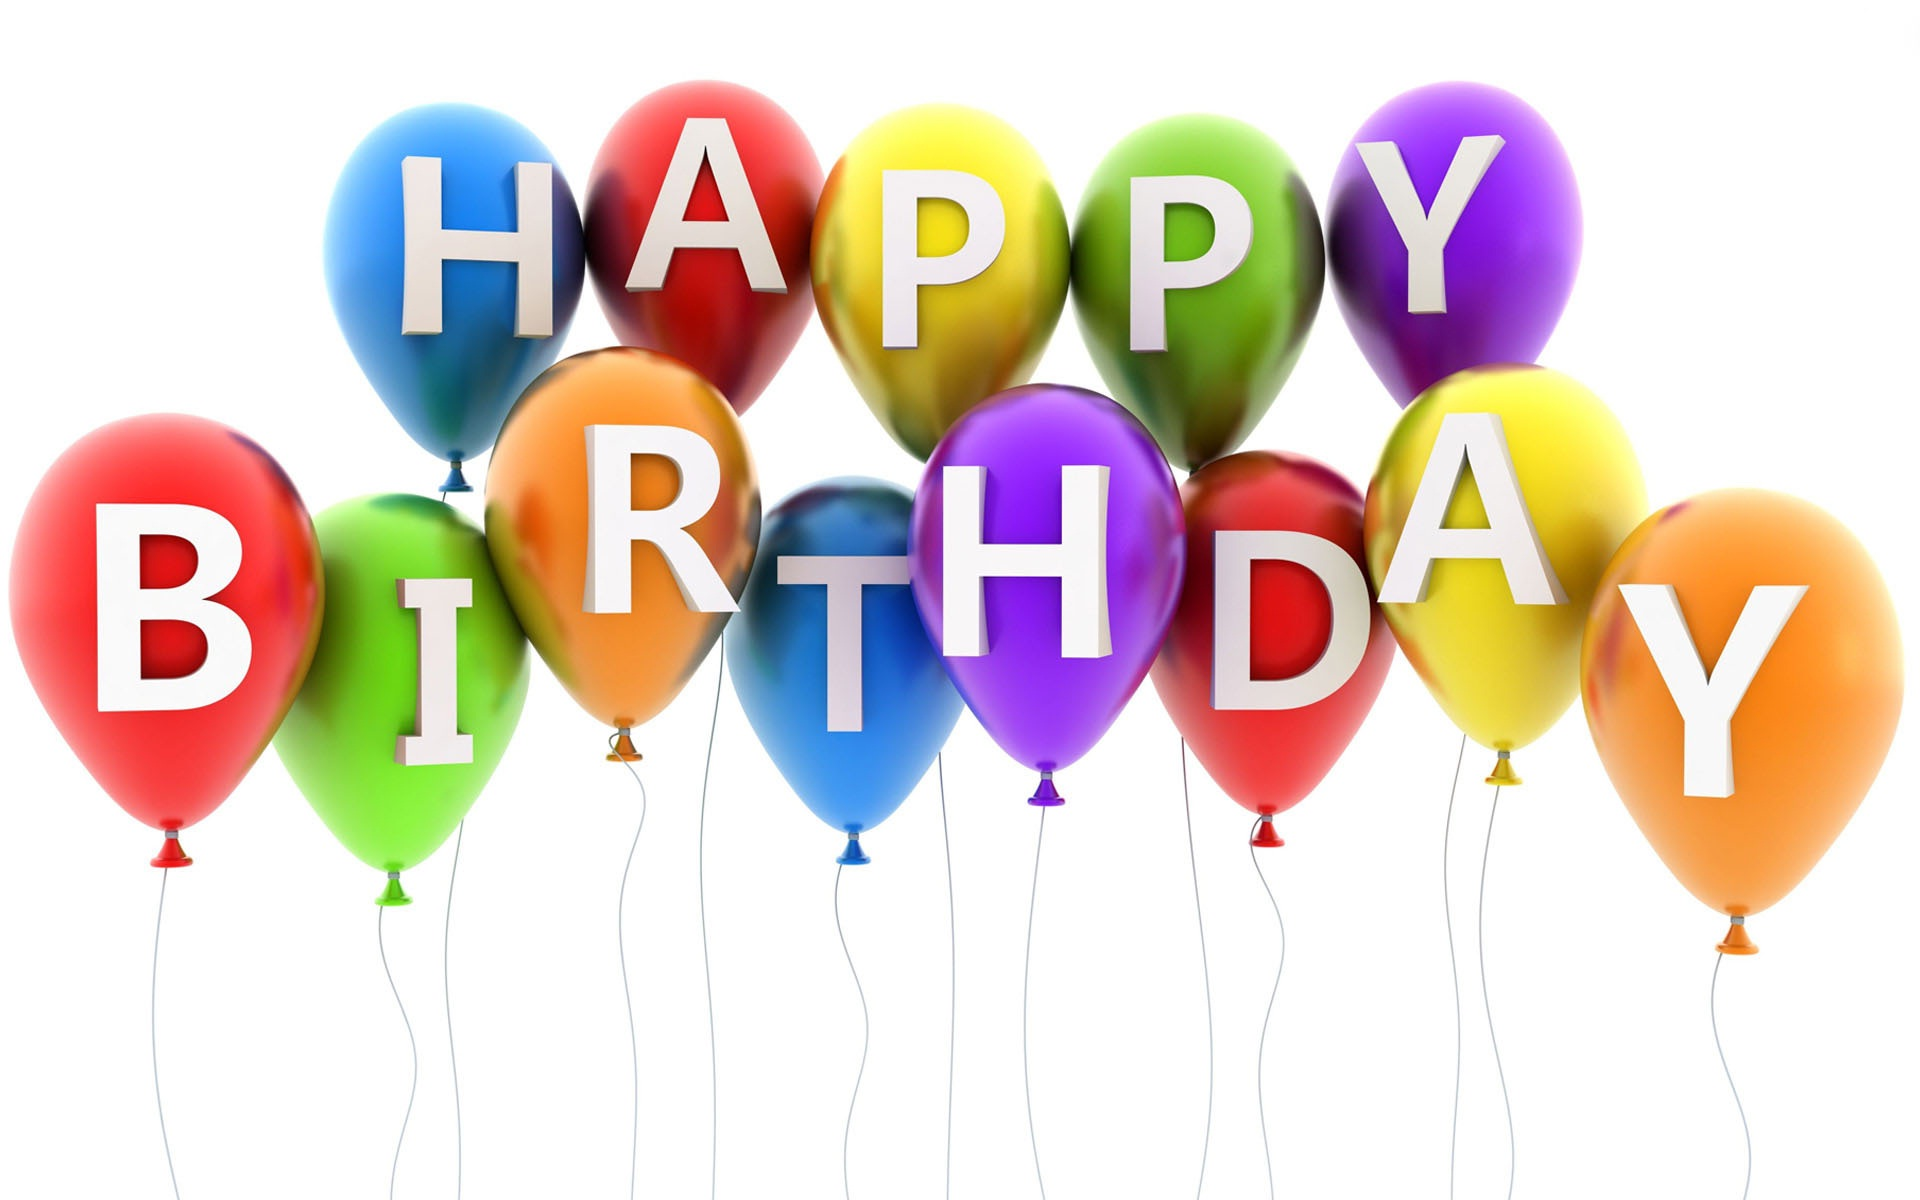 Happy birthday written on balloons HD Wallpapers Rocks 1920x1200